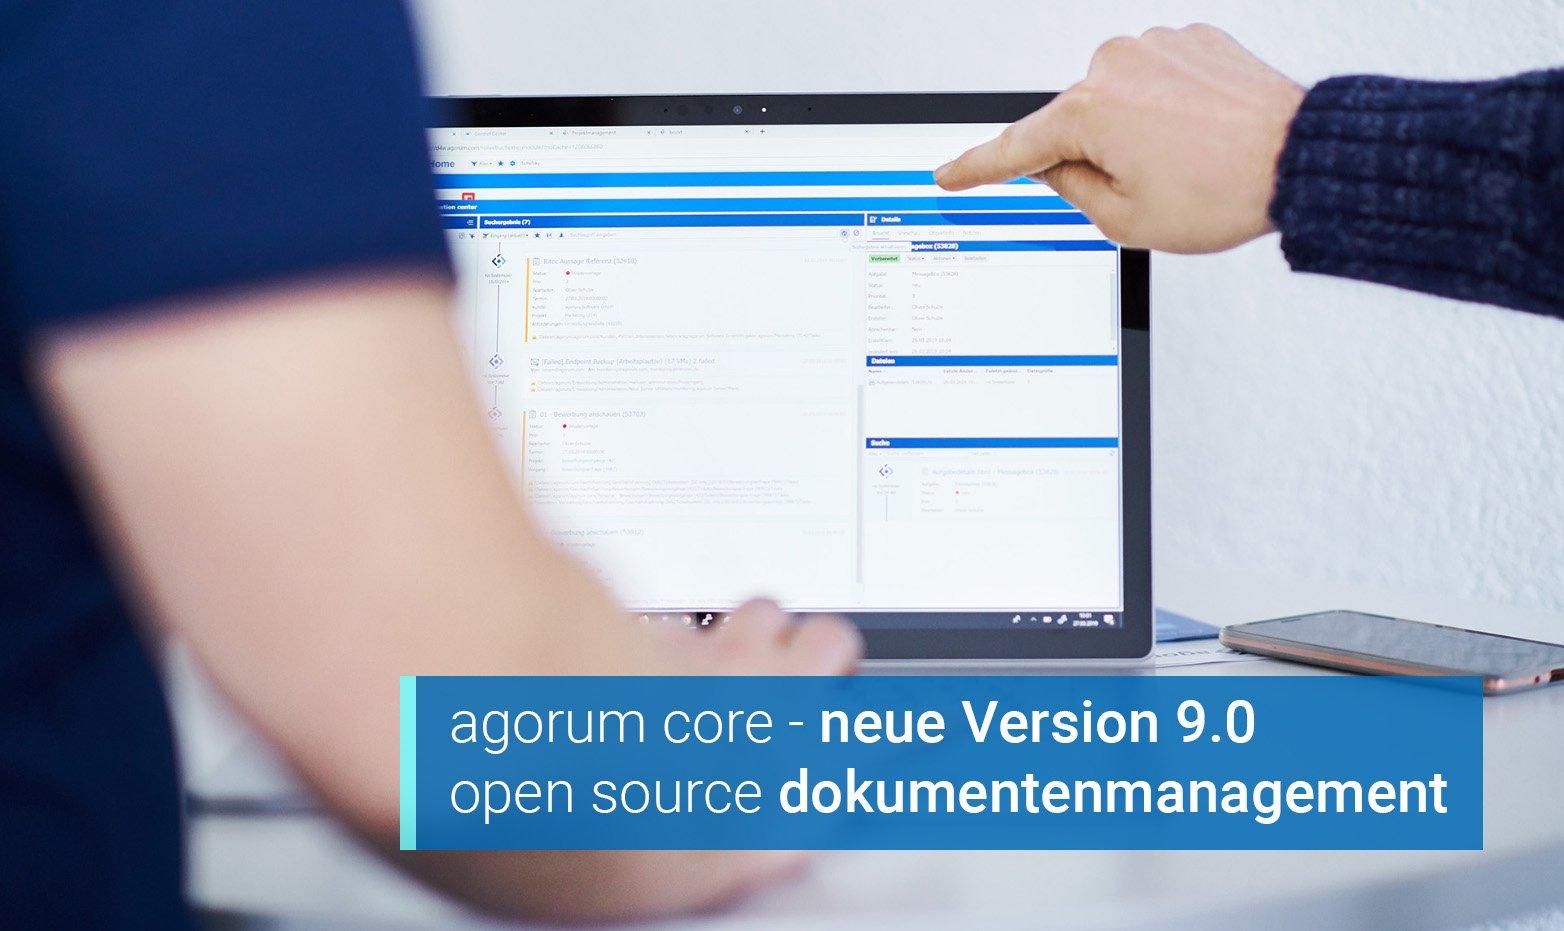 agorum core 9.0 - open source dokumentenmanagement